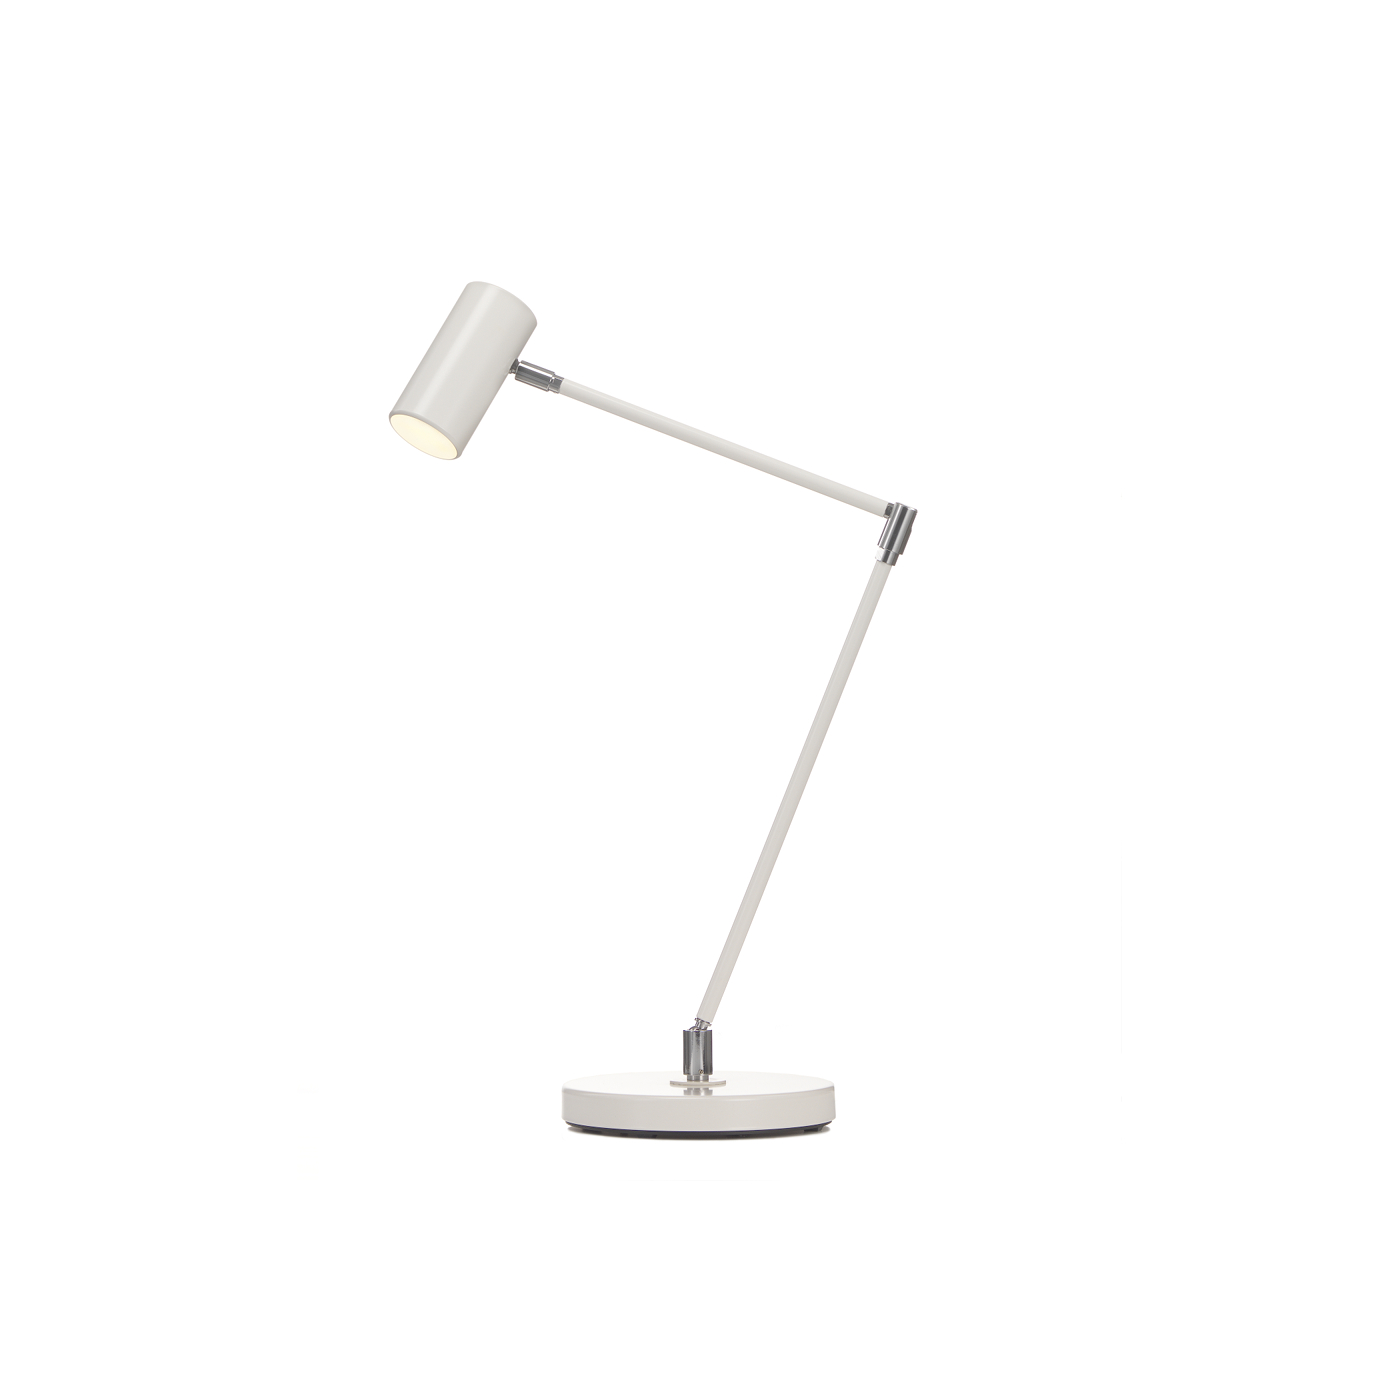 MINIPOINT bordslampa Vit. Örsjö belysning thumbnail